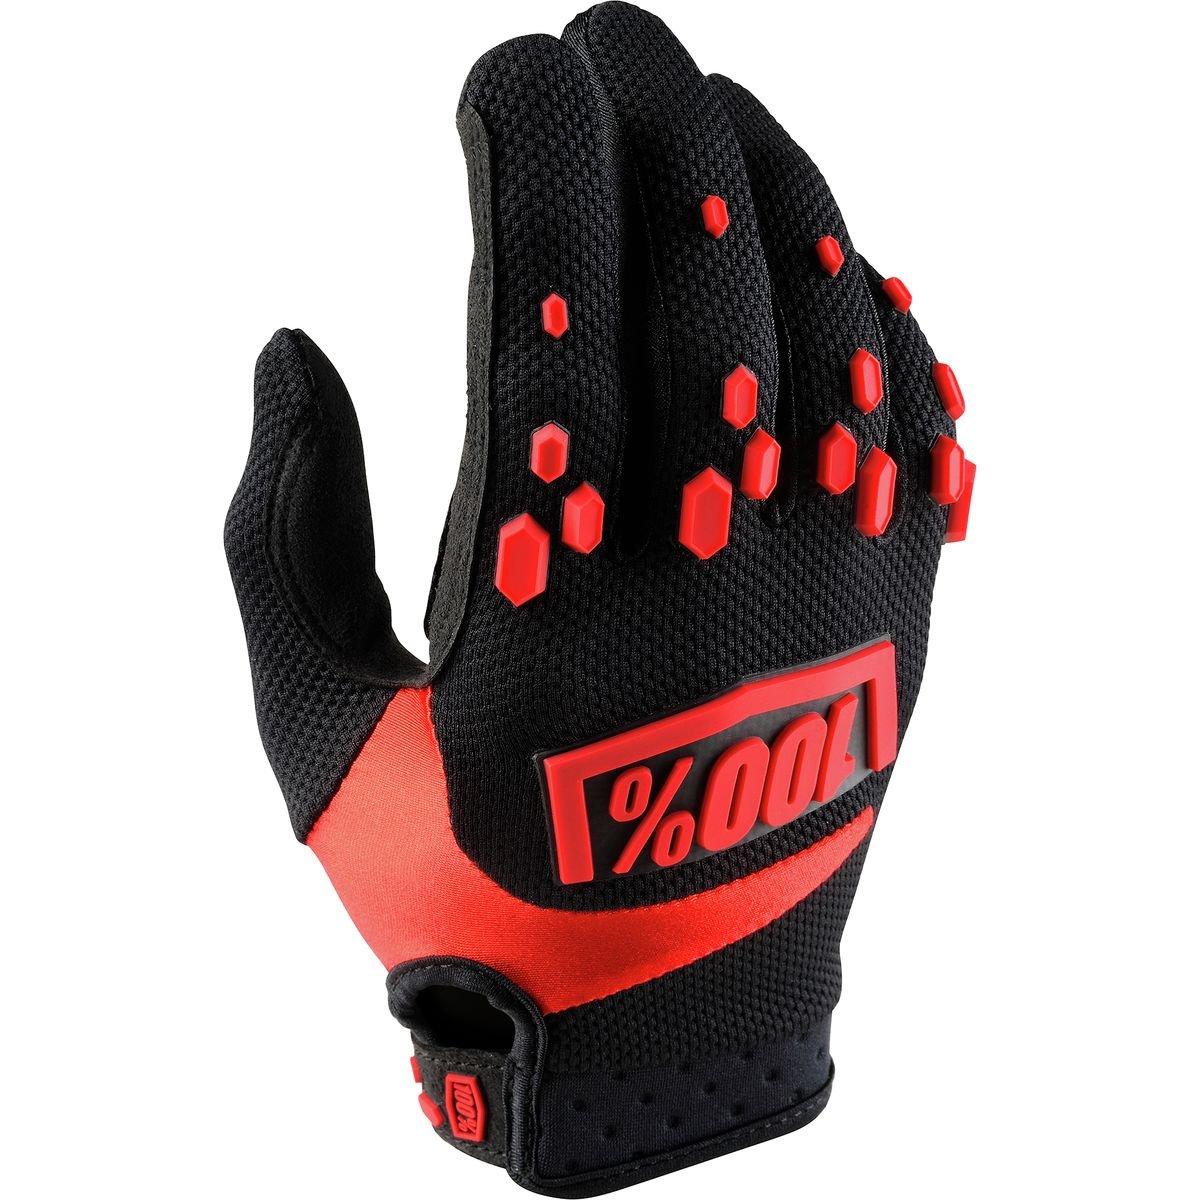 100% Unisex-Adult's Speedlab (10004-013-13)''AIRMATIC Glove Black/Red - X-Large